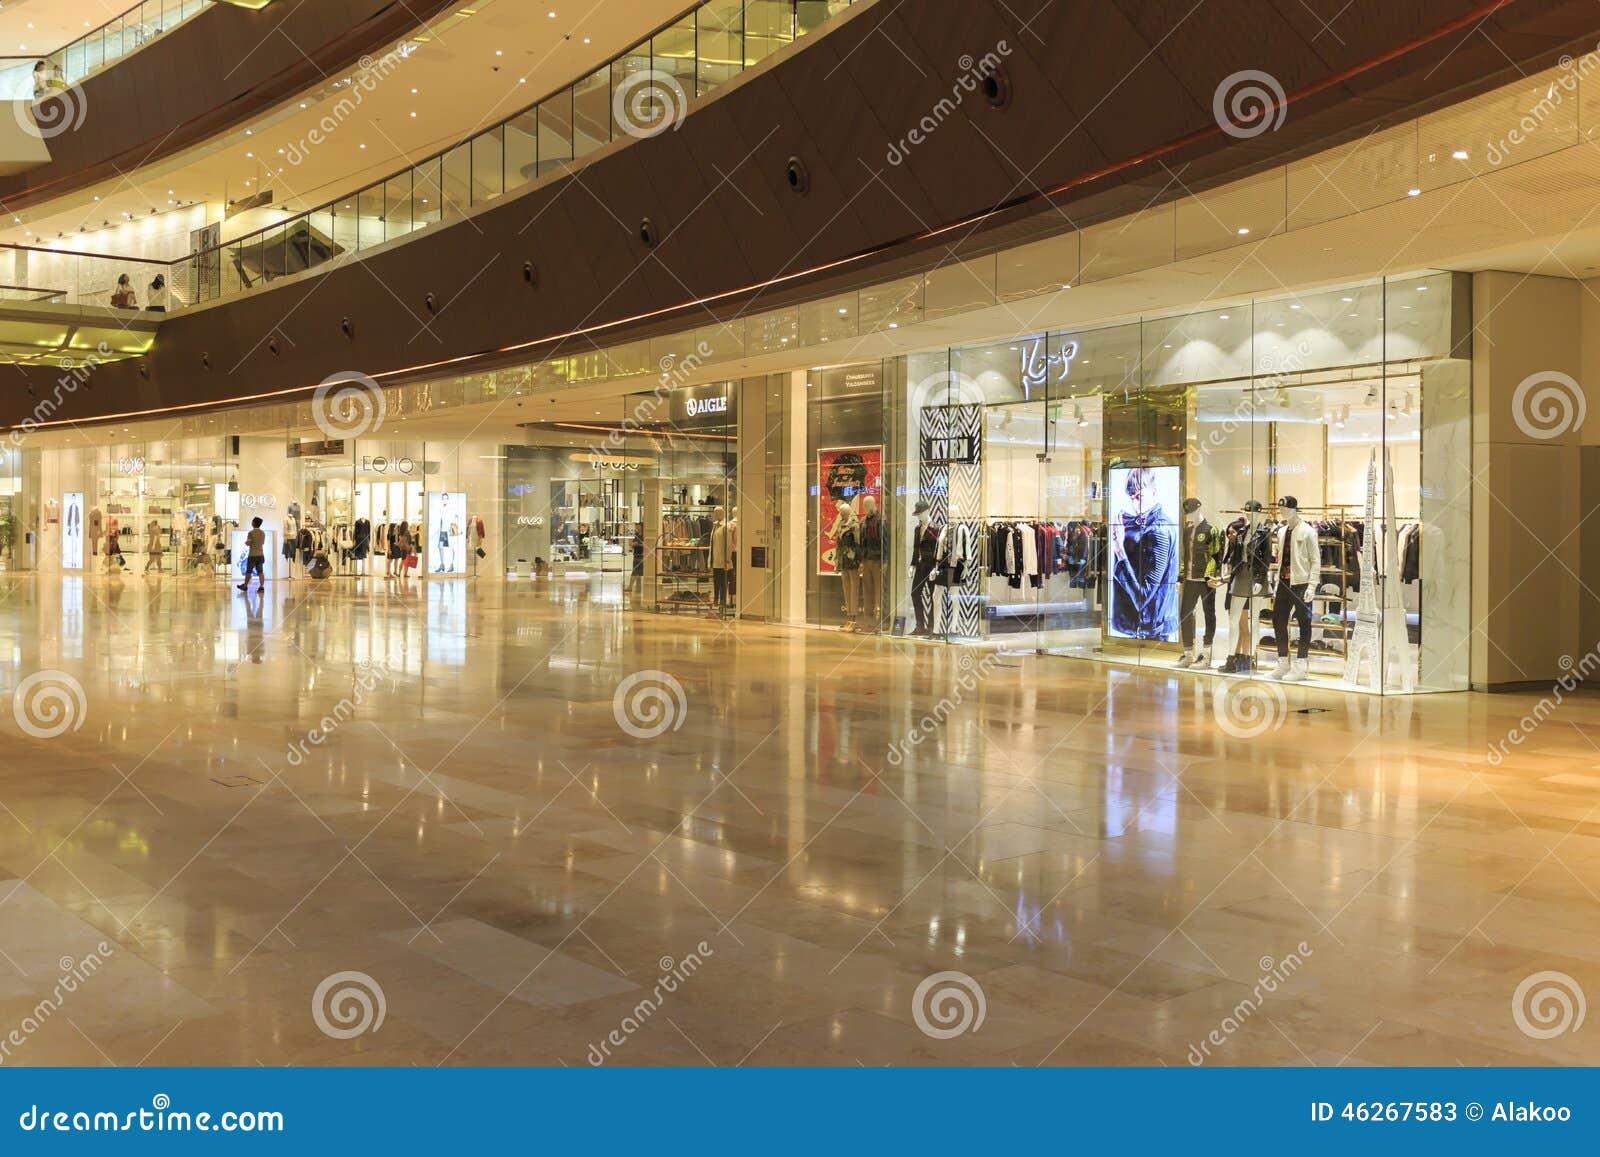 Foyer Hallway Store : Shopping mall editorial stock photo image